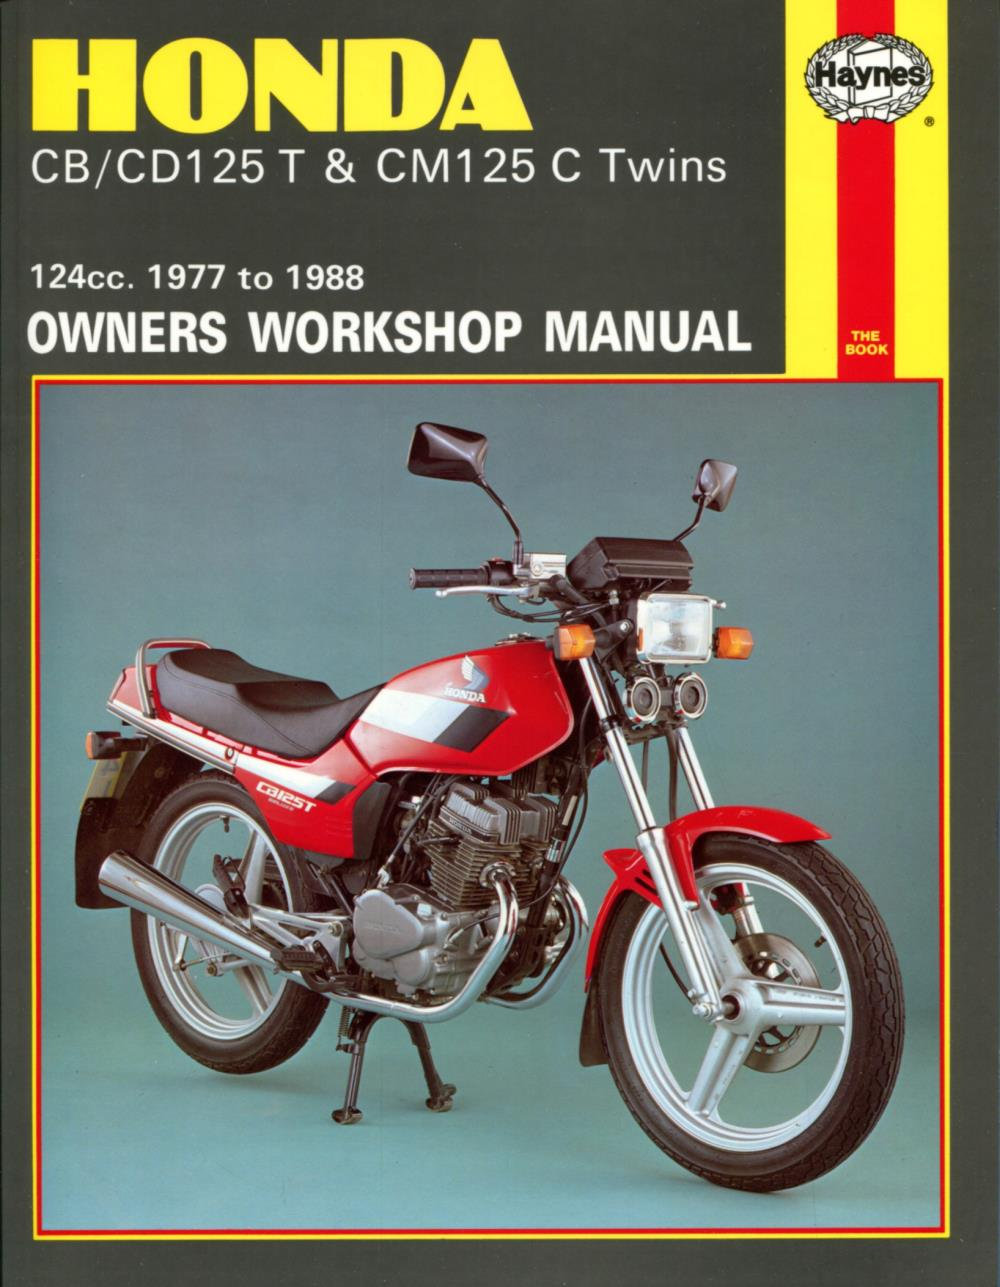 Manual-Haynes-for-1983-Honda-CB-125-TDC-Super-Dream